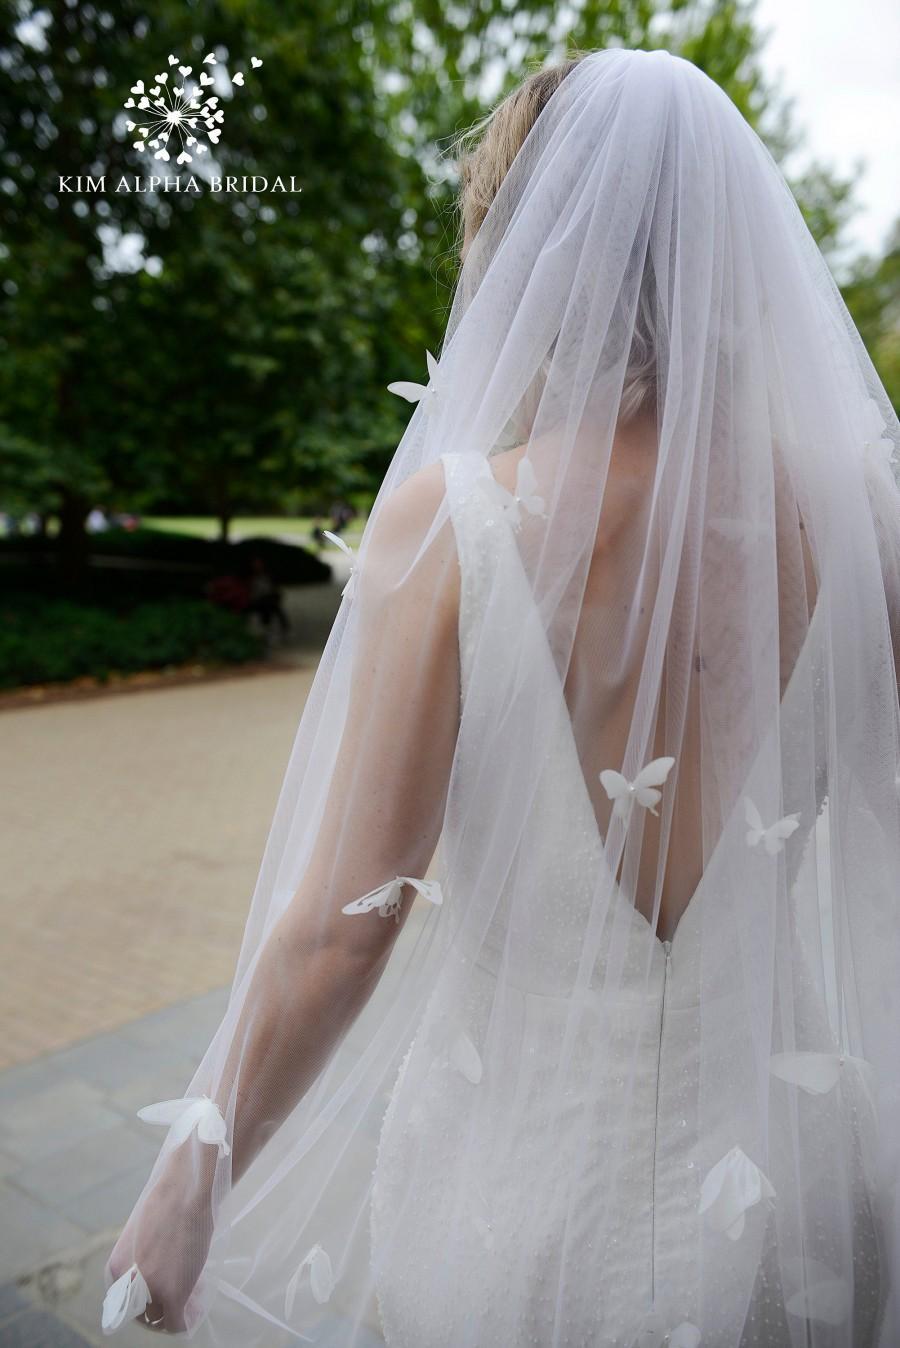 Mariage - CARA veil, butterfly veil, fingertip veil, sparkle veil, sheer veil, glitter veil, bridal veil, wedding veil,